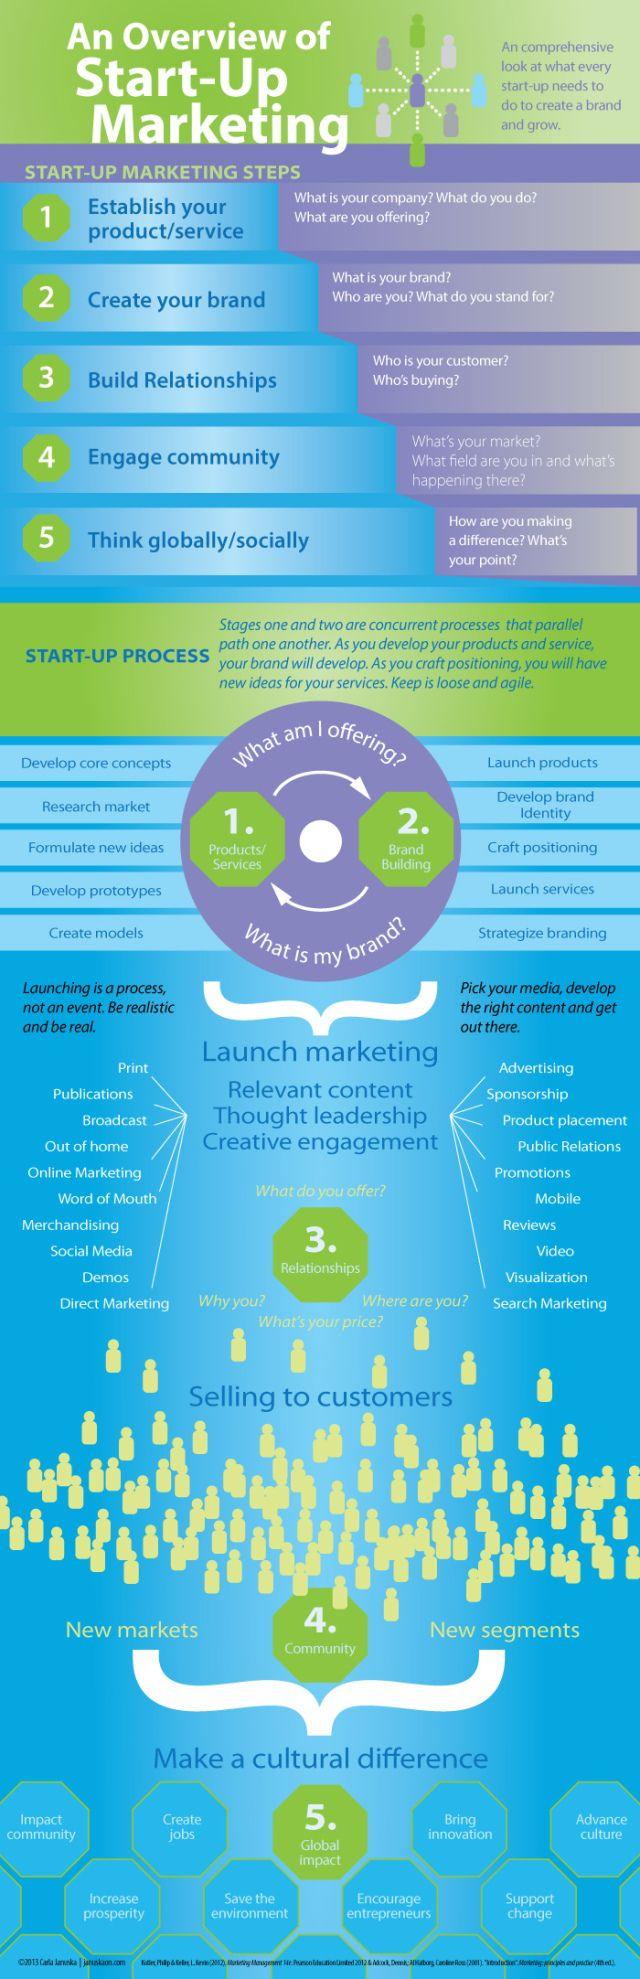 An overview of Startup marketing #infographic #marketing #entrepreneurship